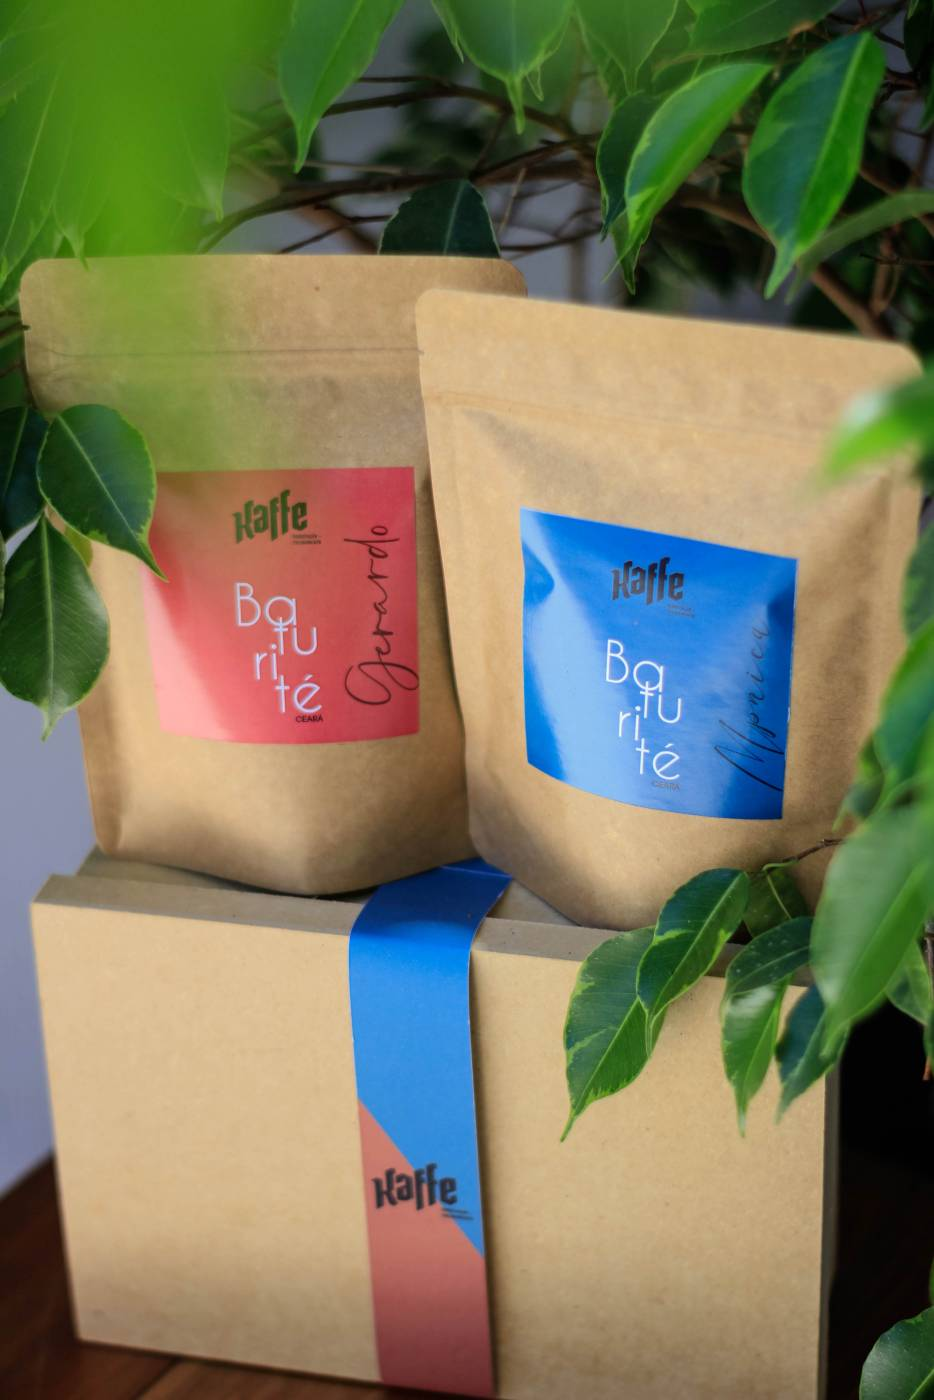 Kit Kaffe Baturité